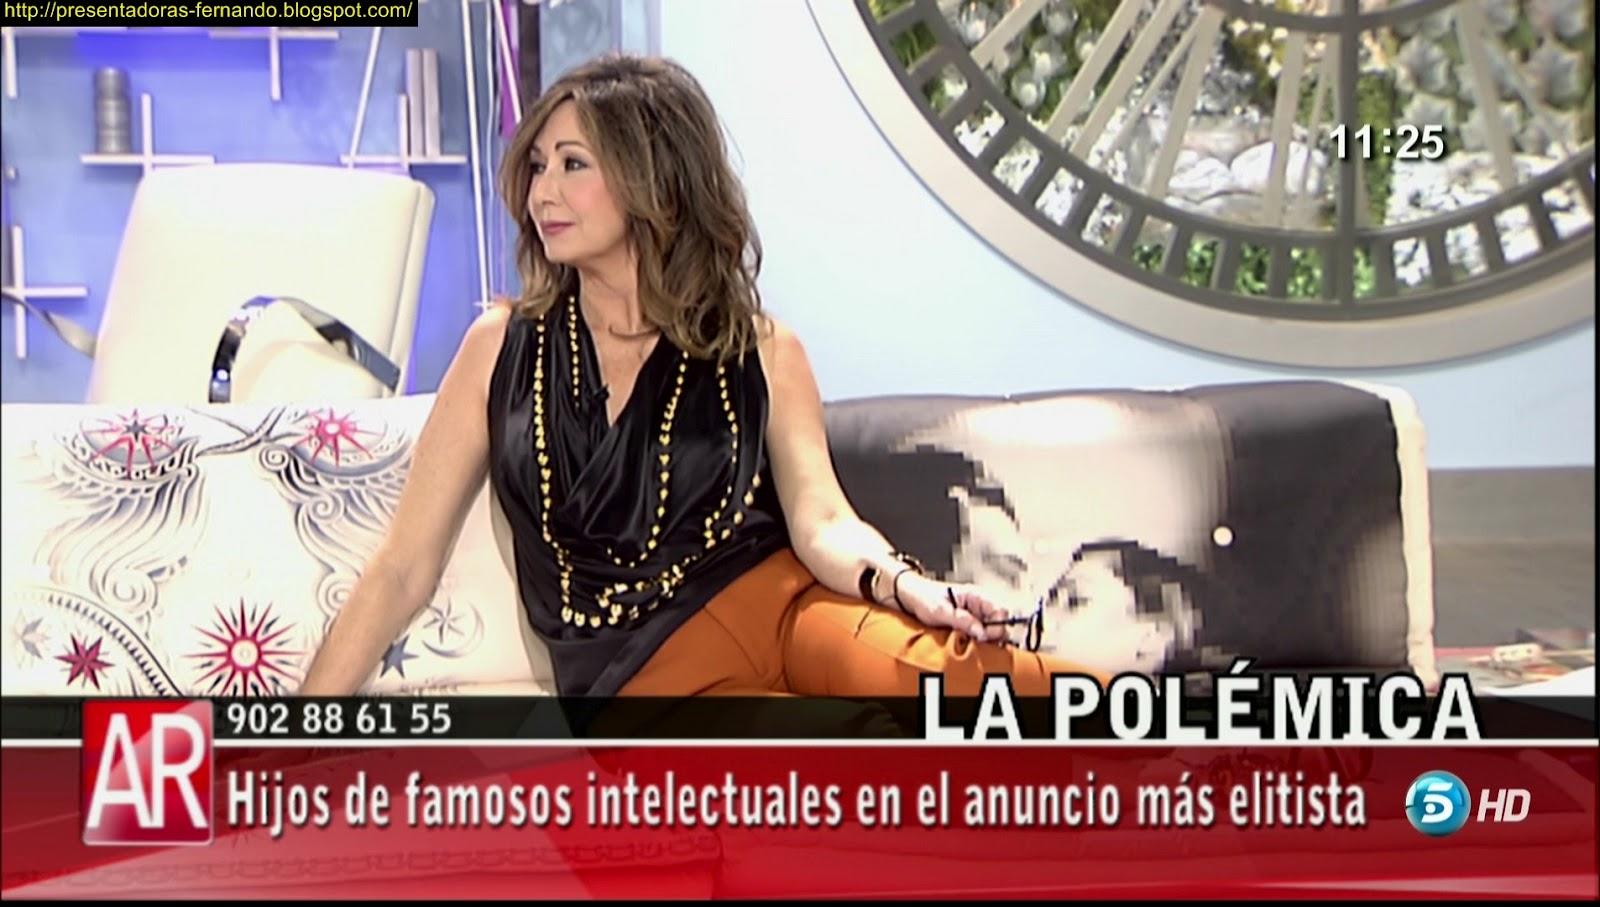 Ana Rosa Quintana Follando presentadoras-fernando: ana rosa quintana y beatriz cortazar